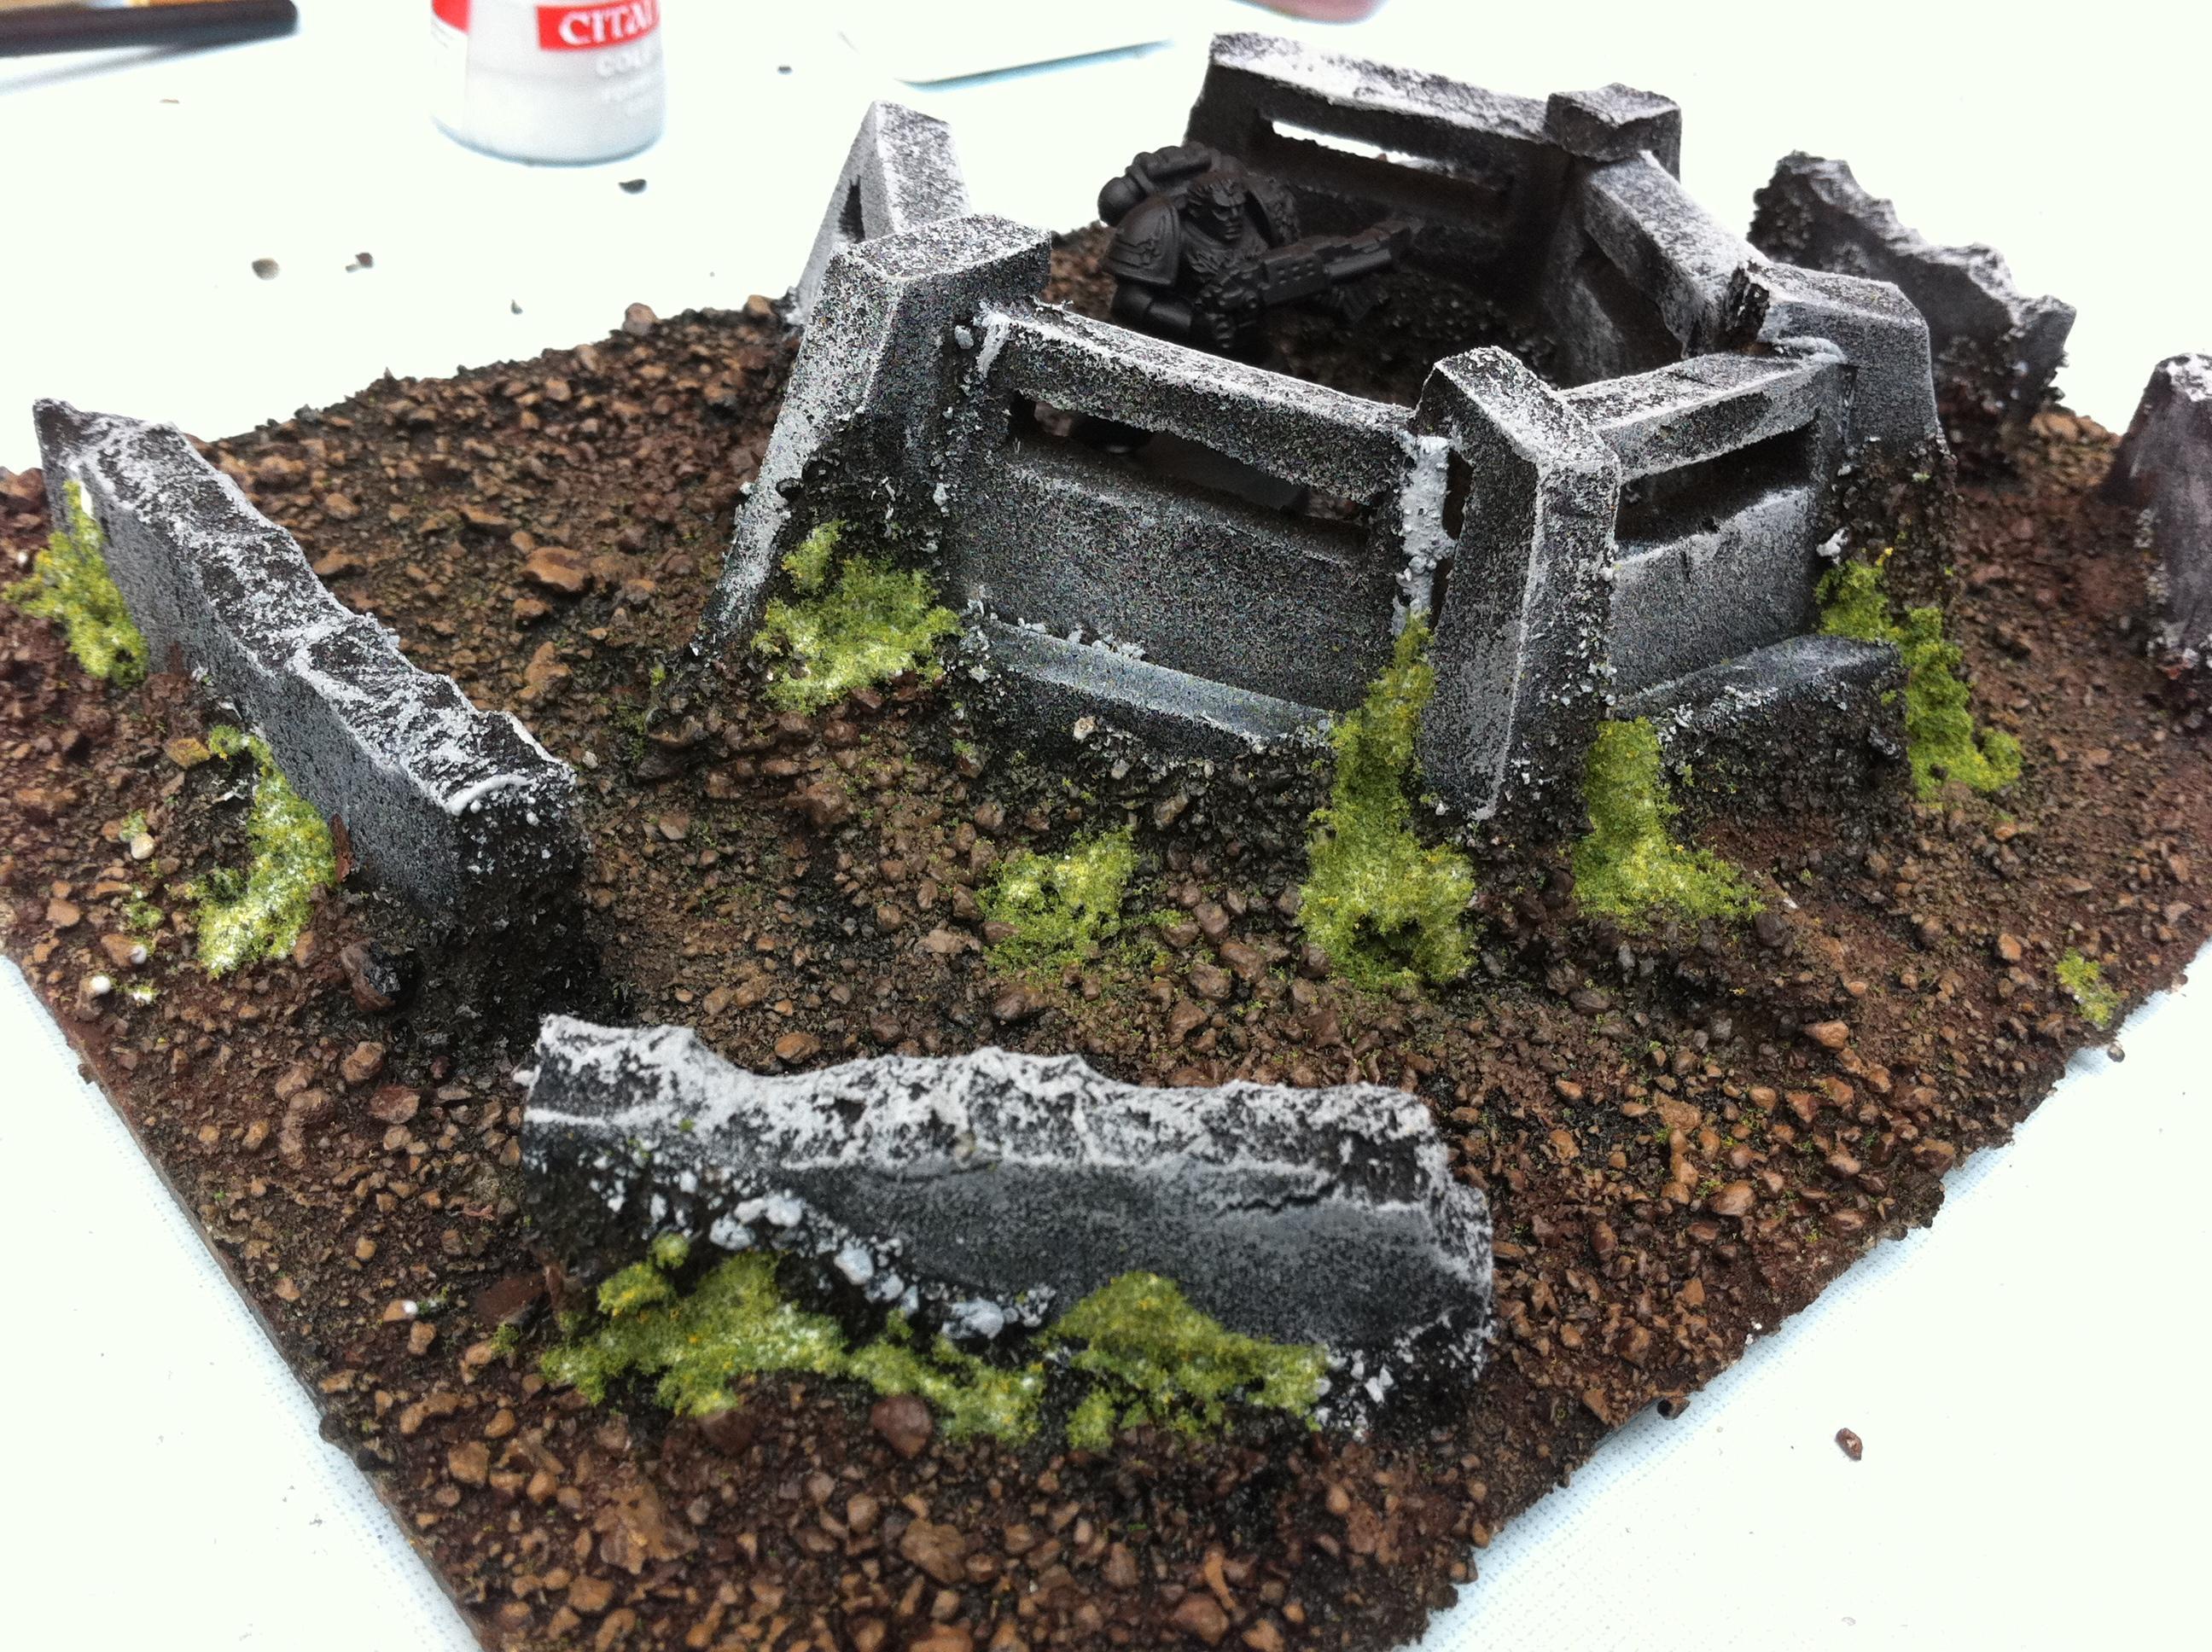 Bunker, Terrain, Warhammer 40,000